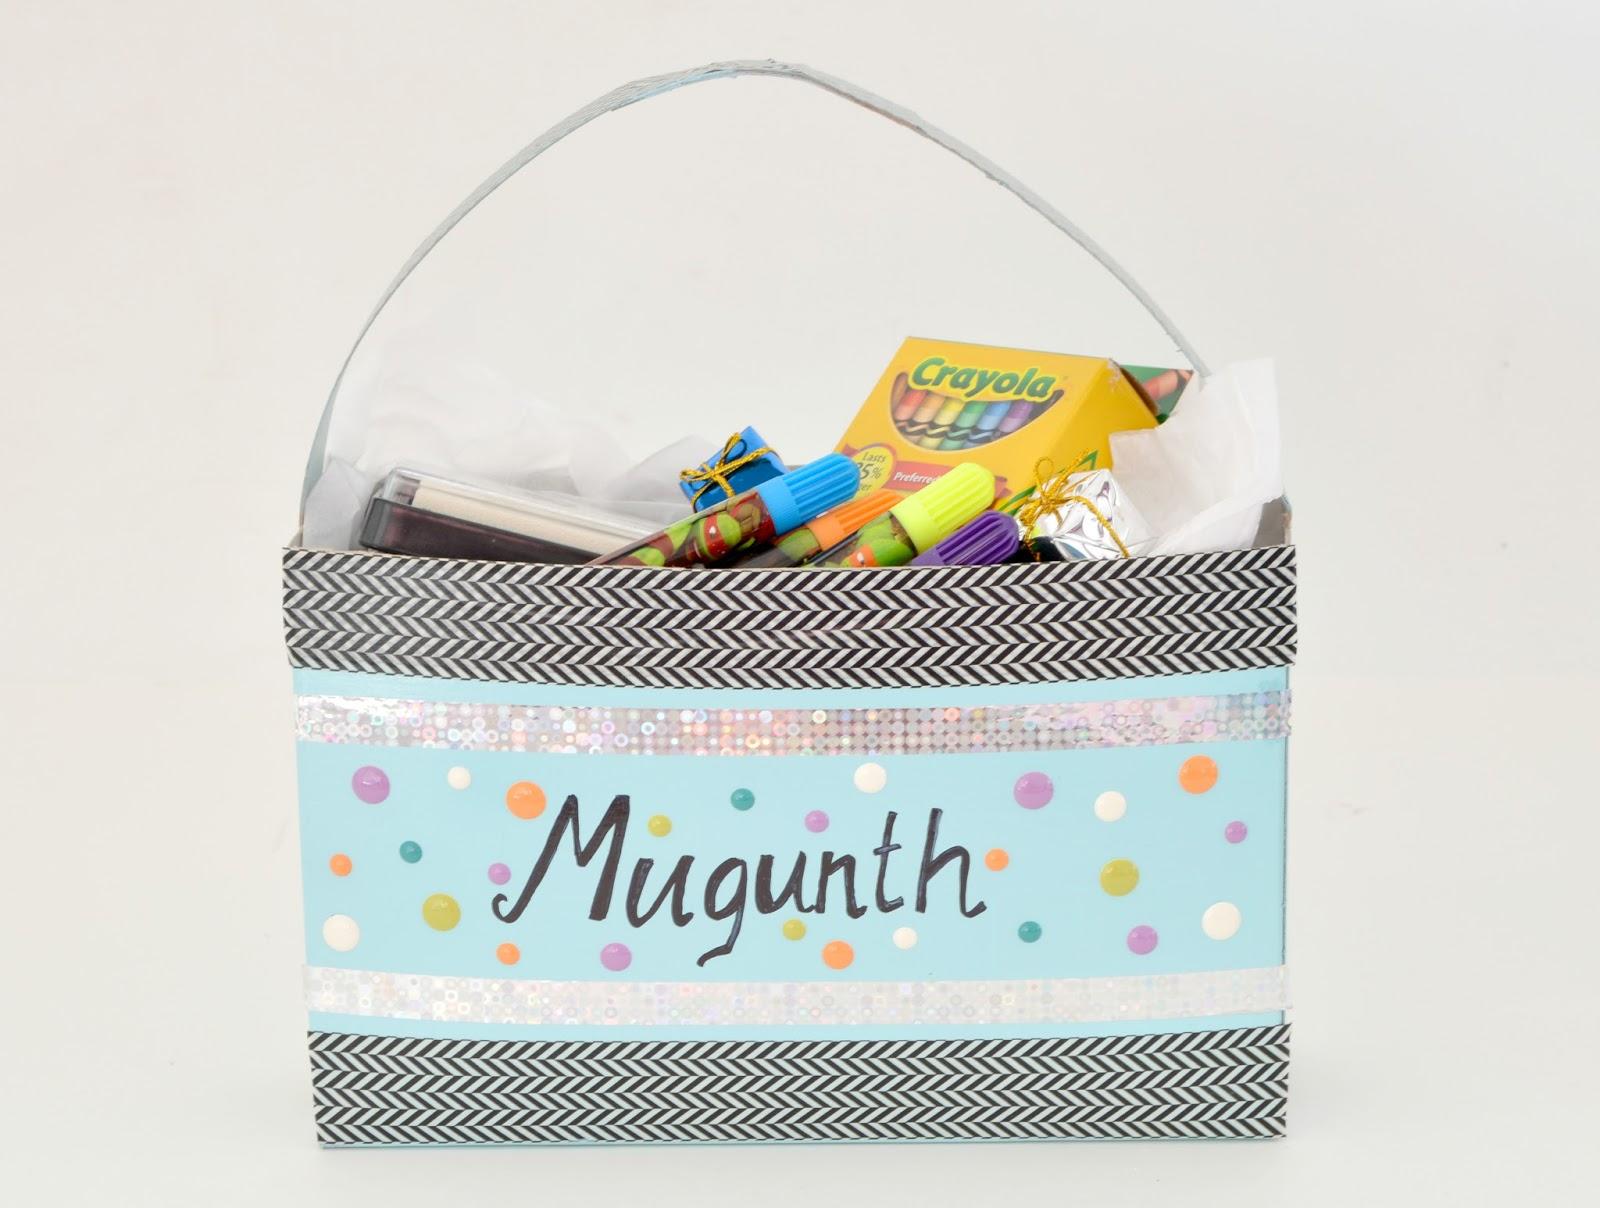 Vikalpah Diy Easter Baskets From Cereal Box Milk Jug